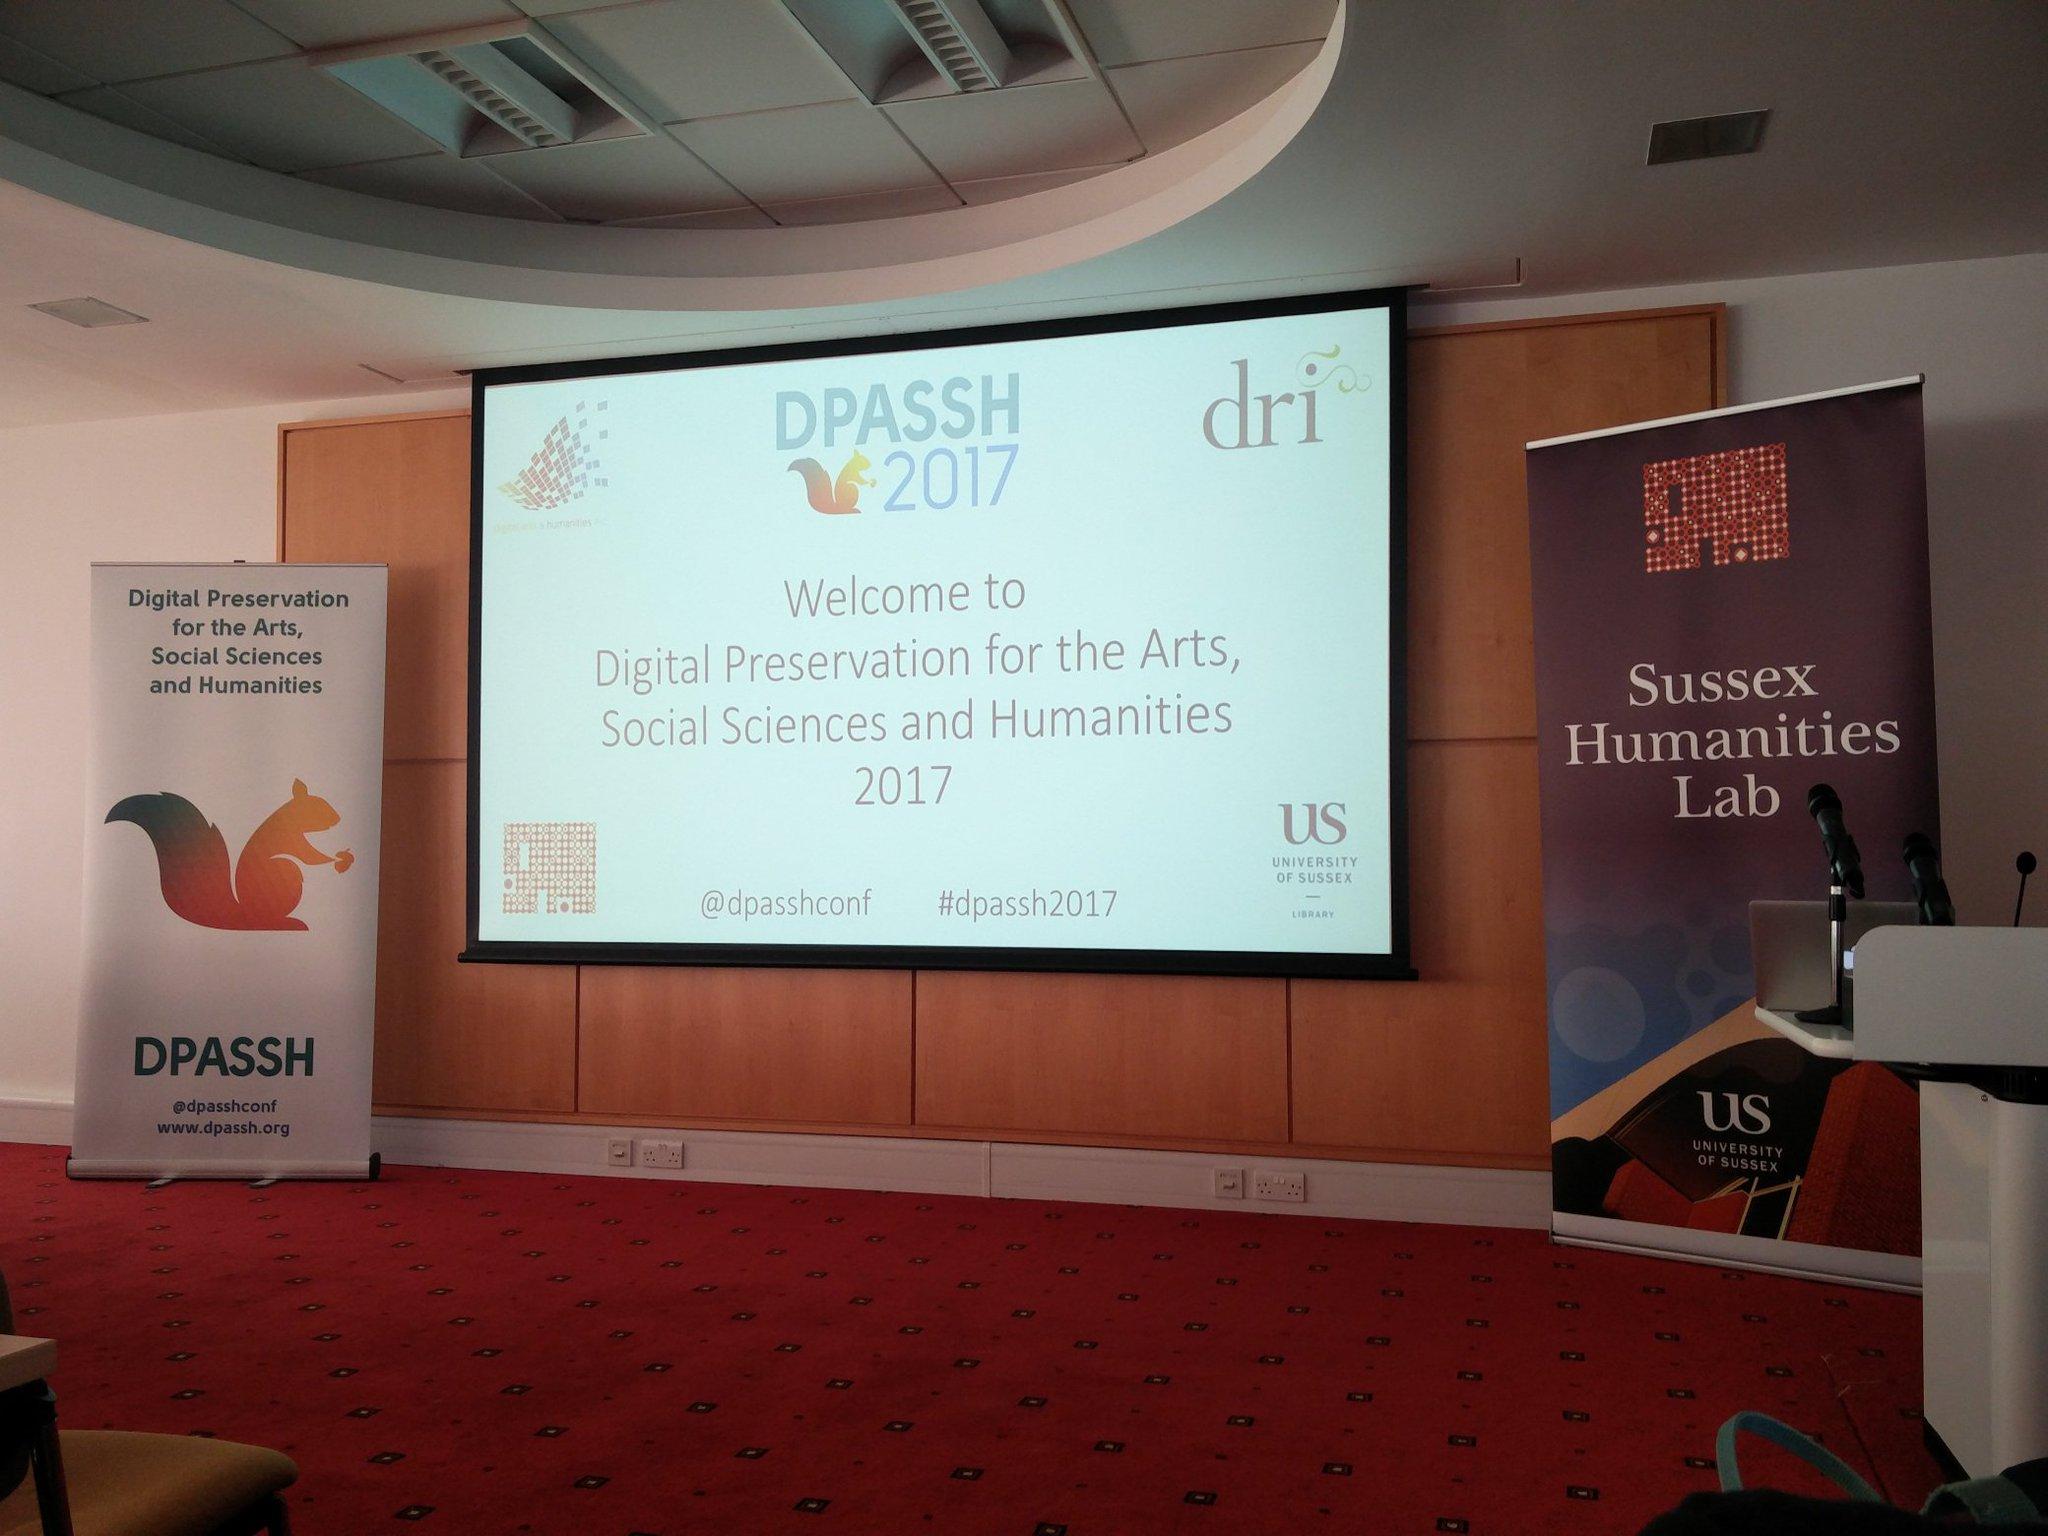 Yay! We've arrived #dpassh2017 got a sneak preview of Lizzy Jongma's presentation, sounds great! https://t.co/p7GFxxobim